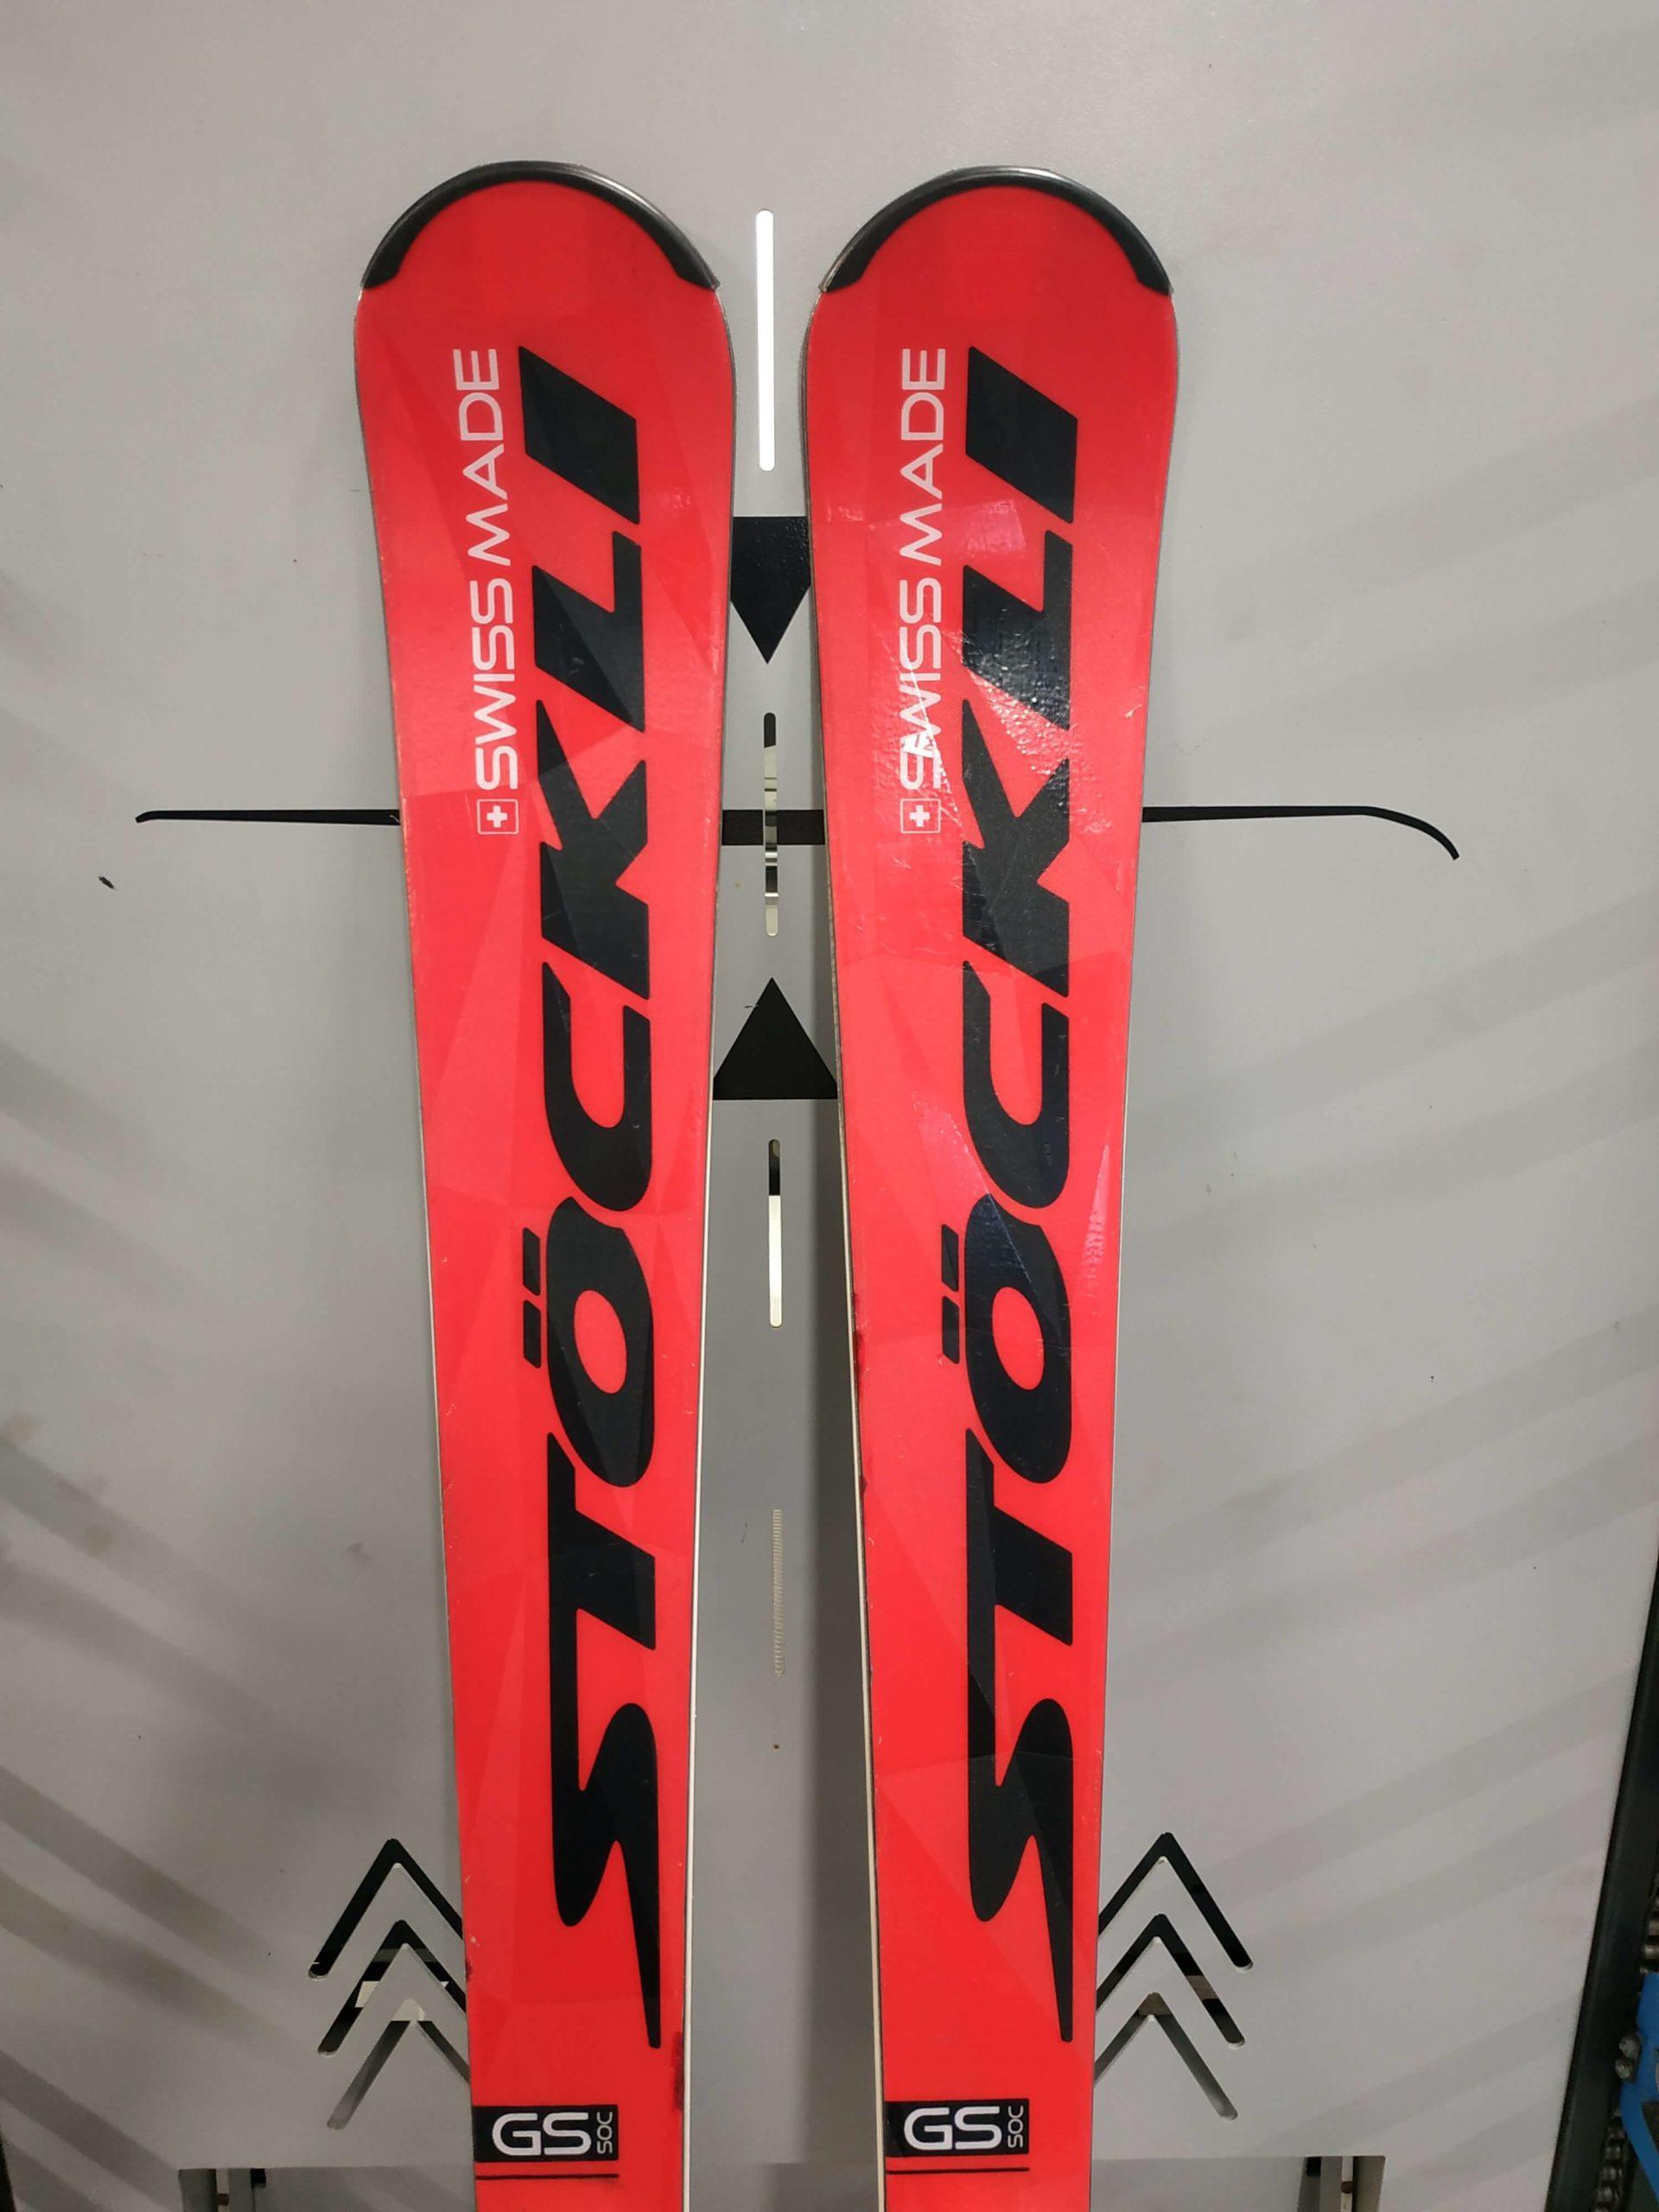 3. Stockli GS Laser VRT 170 R16.1 (2)